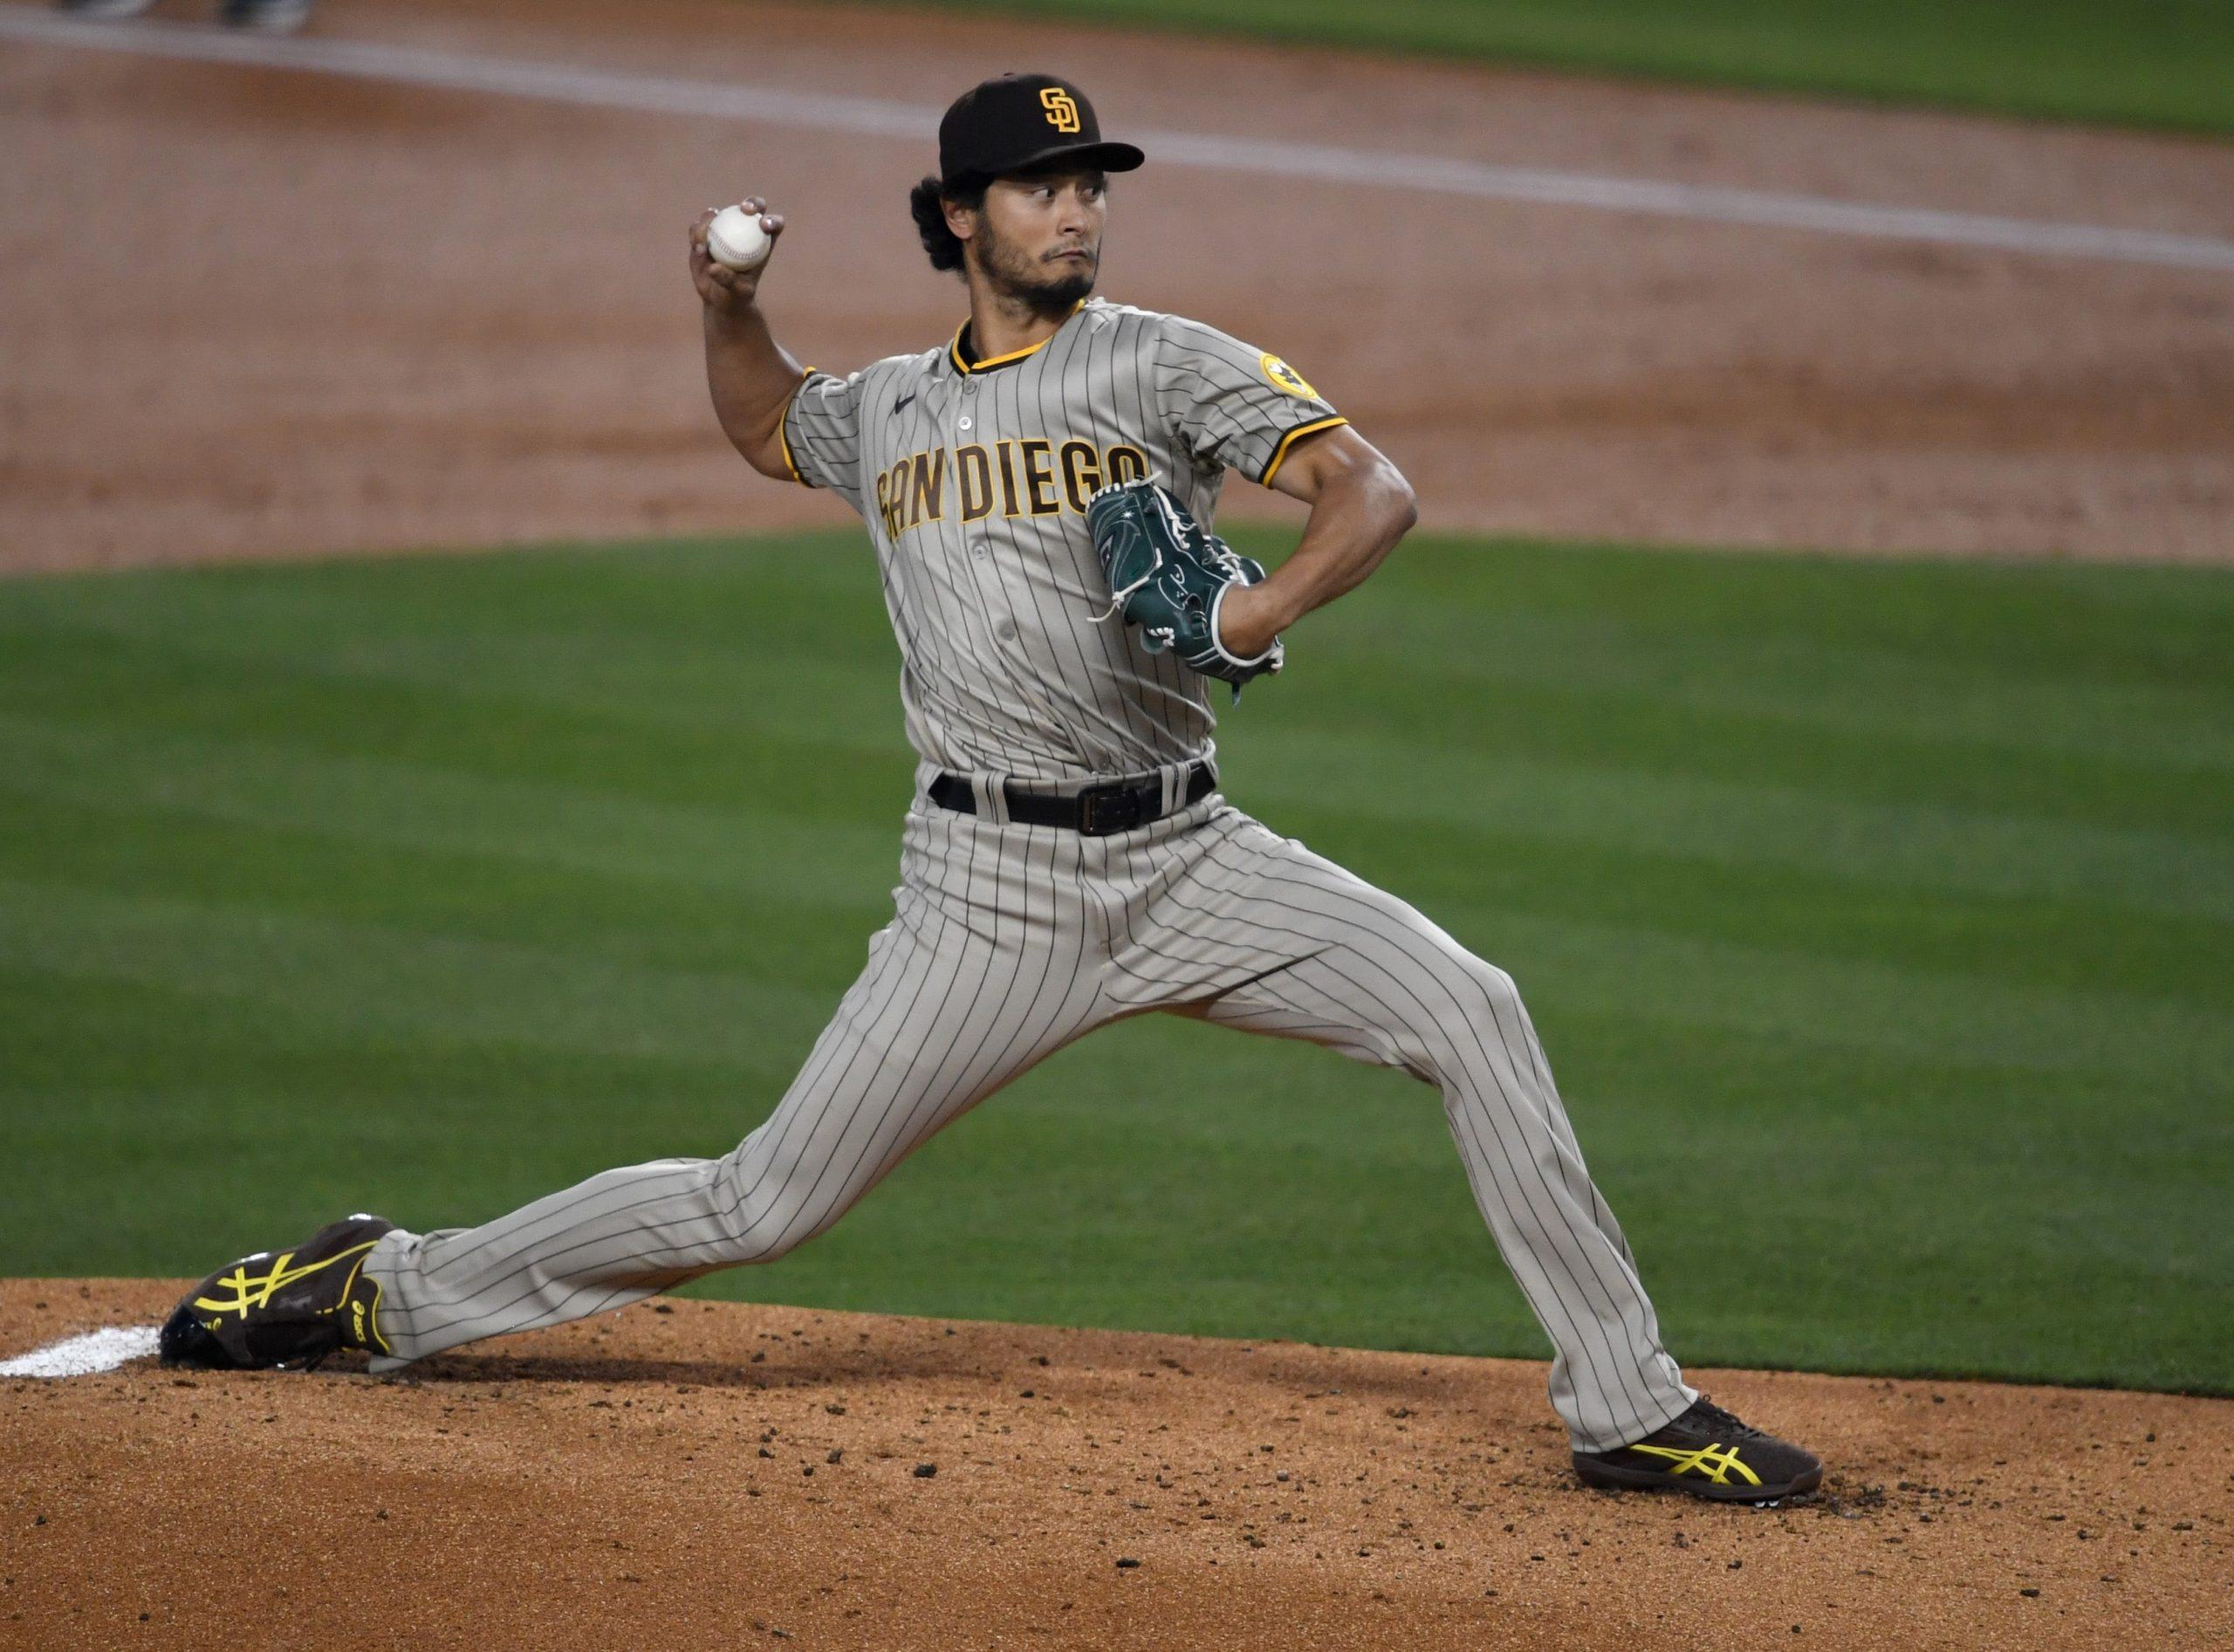 Yu Darvish of the San Diego Padres